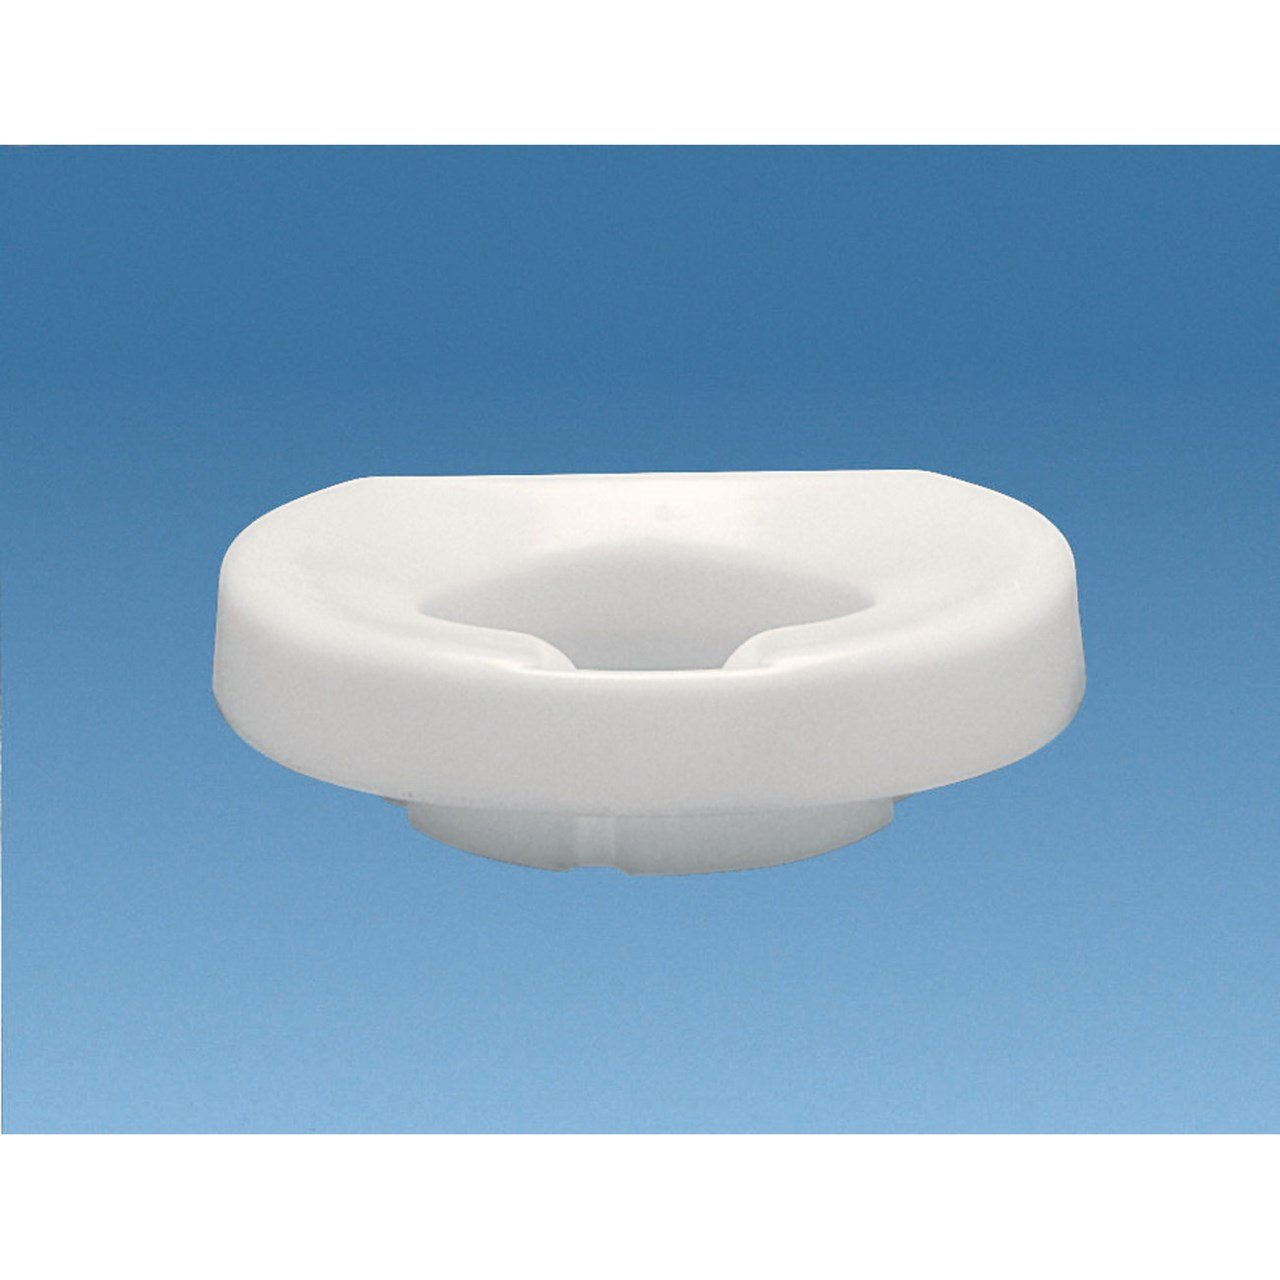 elongated raised toilet seat. amazon.com: sp ableware tall-ette 6-inch elongated elevated toilet seat (725831006): health \u0026 personal care raised l